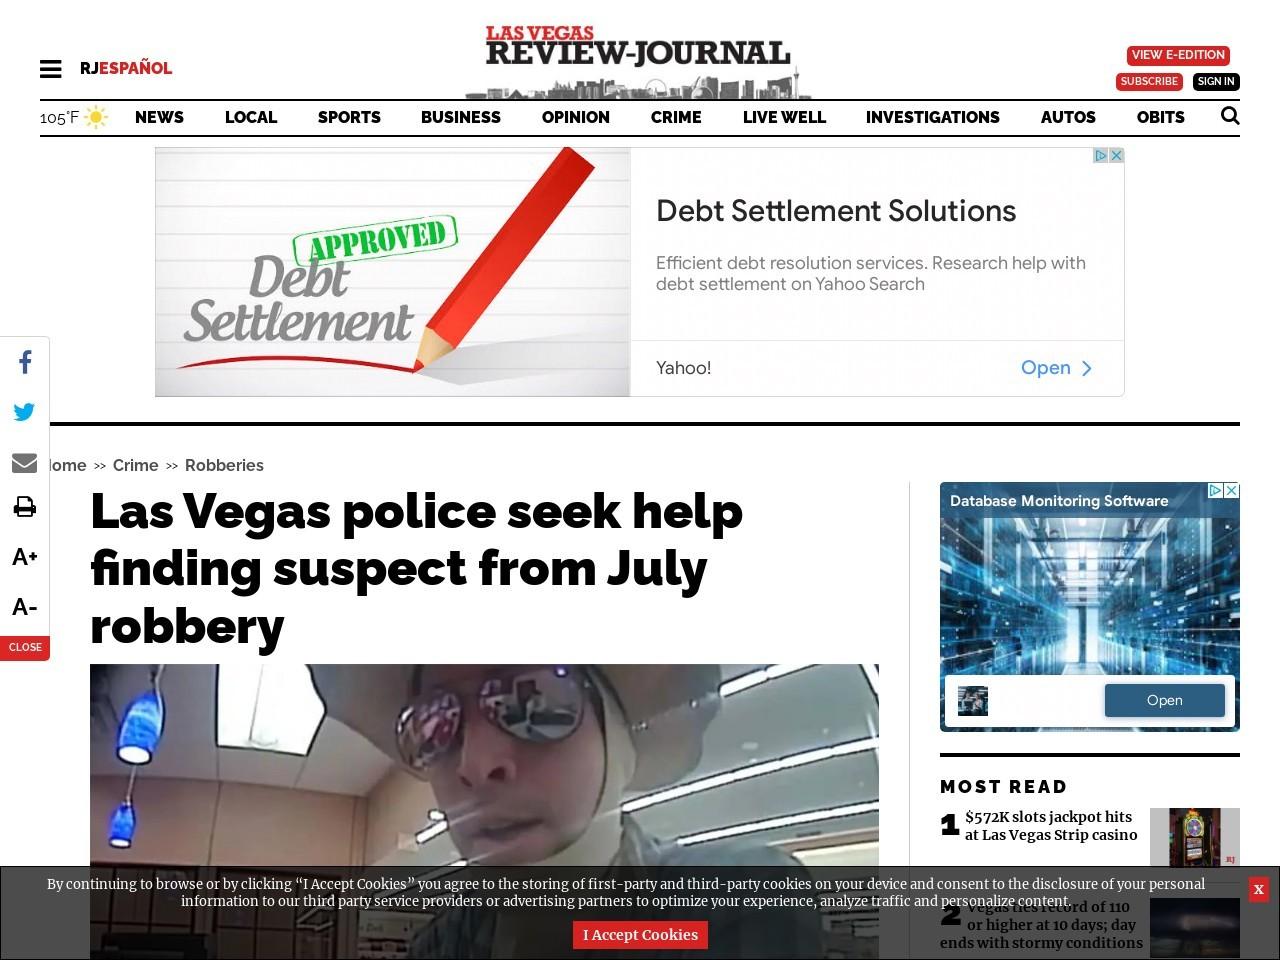 Las Vegas police seek help finding suspect from July robbery